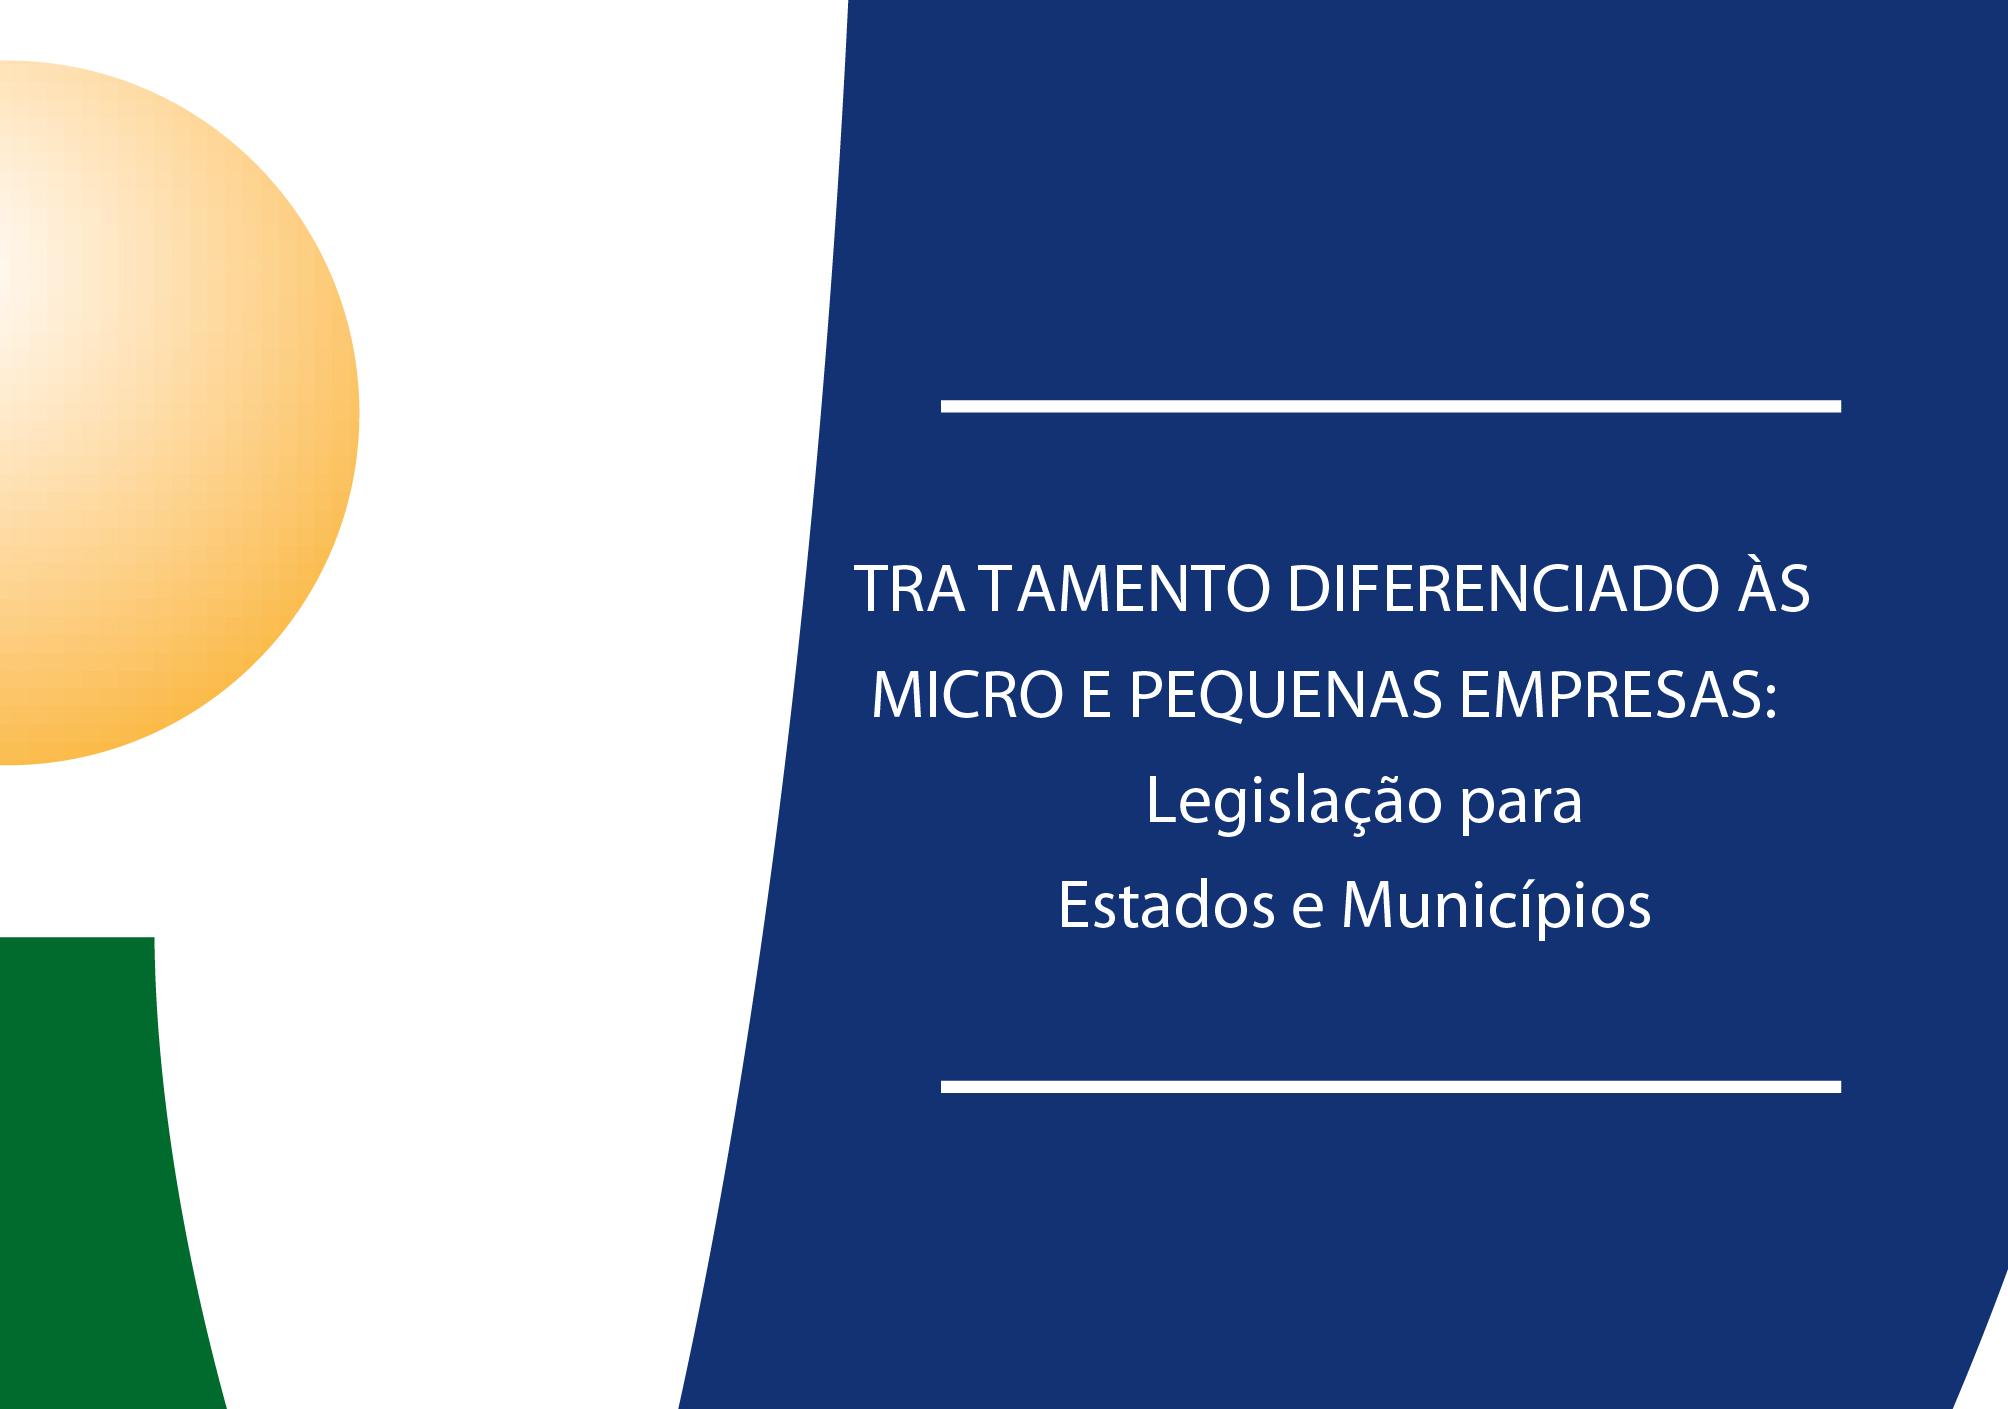 Cartilha sobre Micro e Pequenas Empresas voltada para Estados e Municípios já está disponível